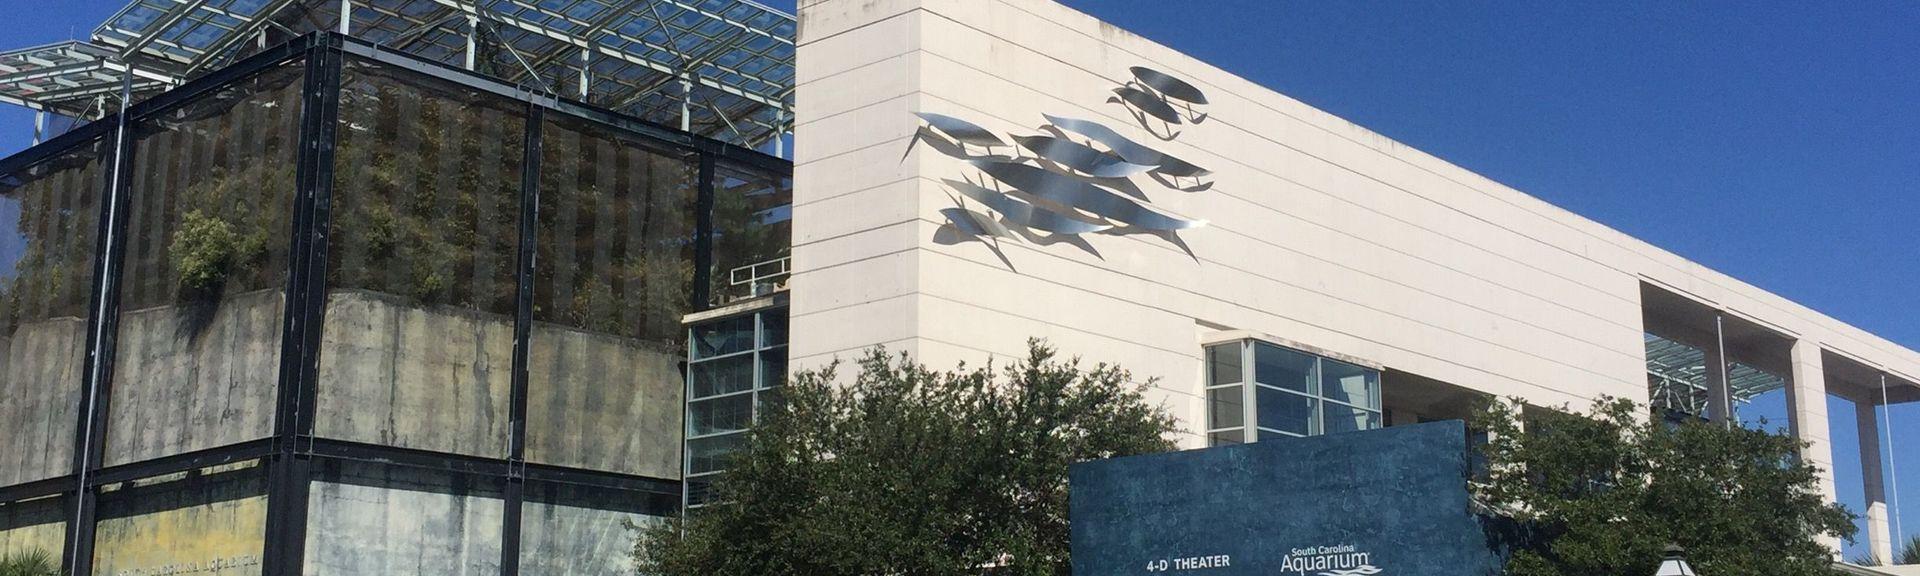 South Carolina Aquarium, Charleston, South Carolina, United States